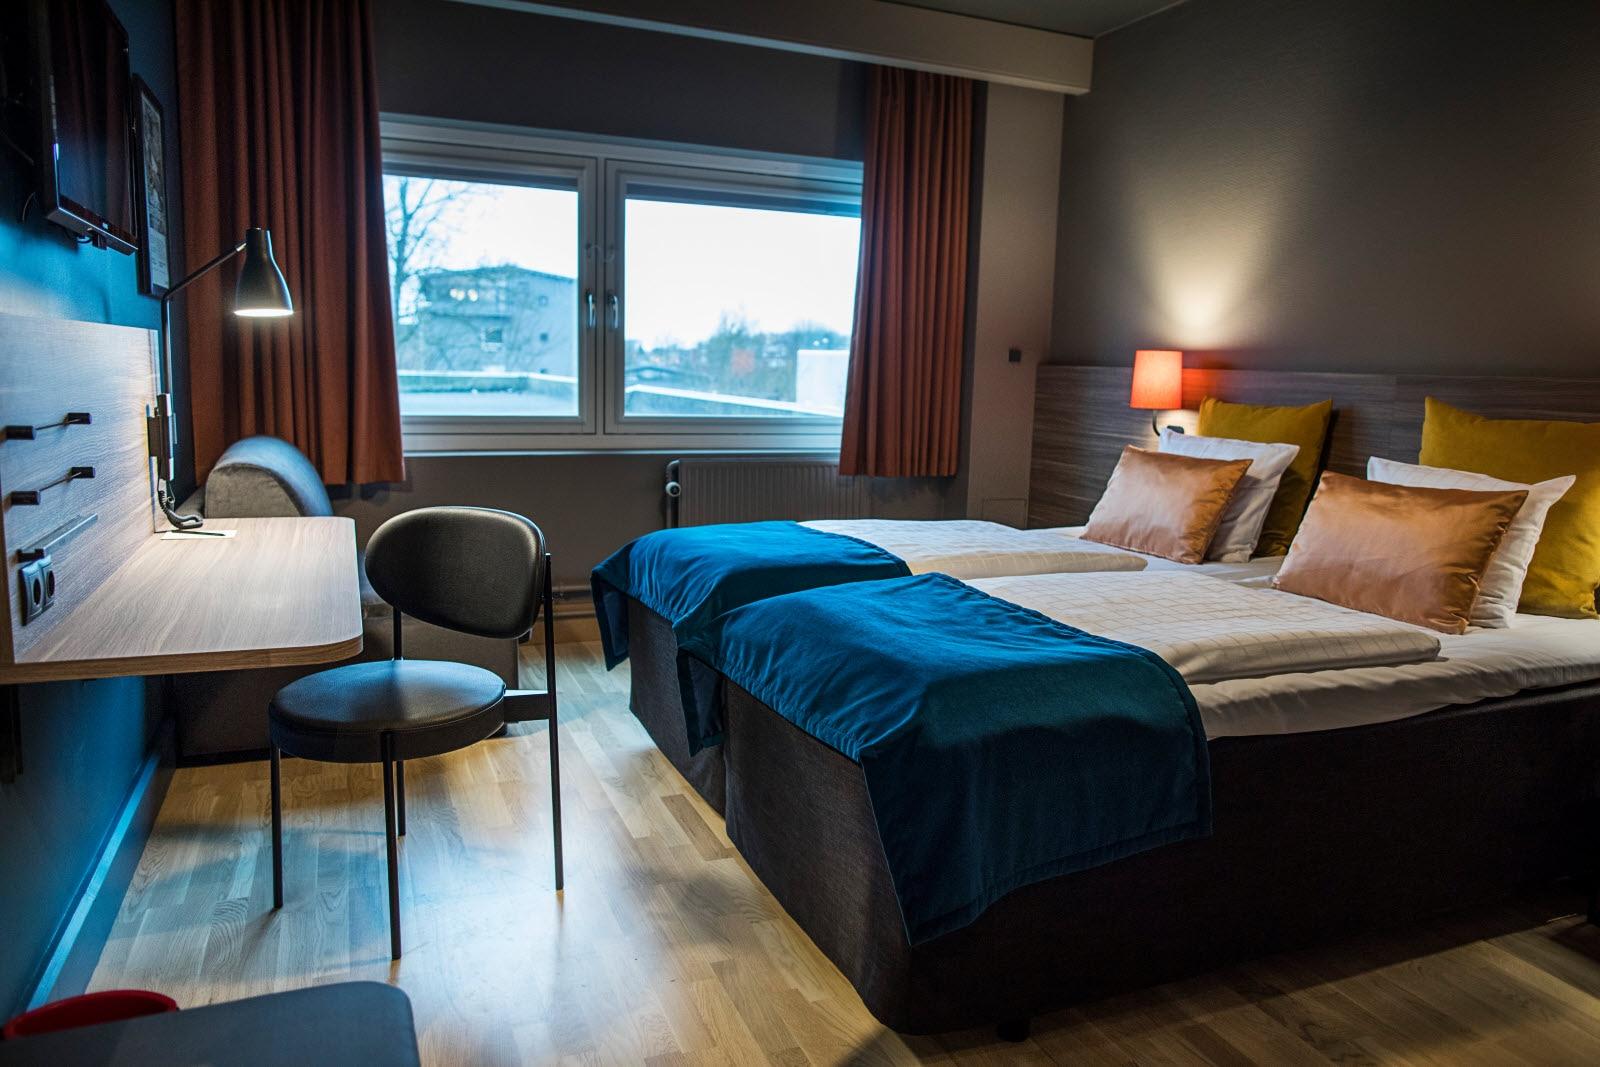 scandic glostrup hotel in kopenhagen scandic hotels. Black Bedroom Furniture Sets. Home Design Ideas